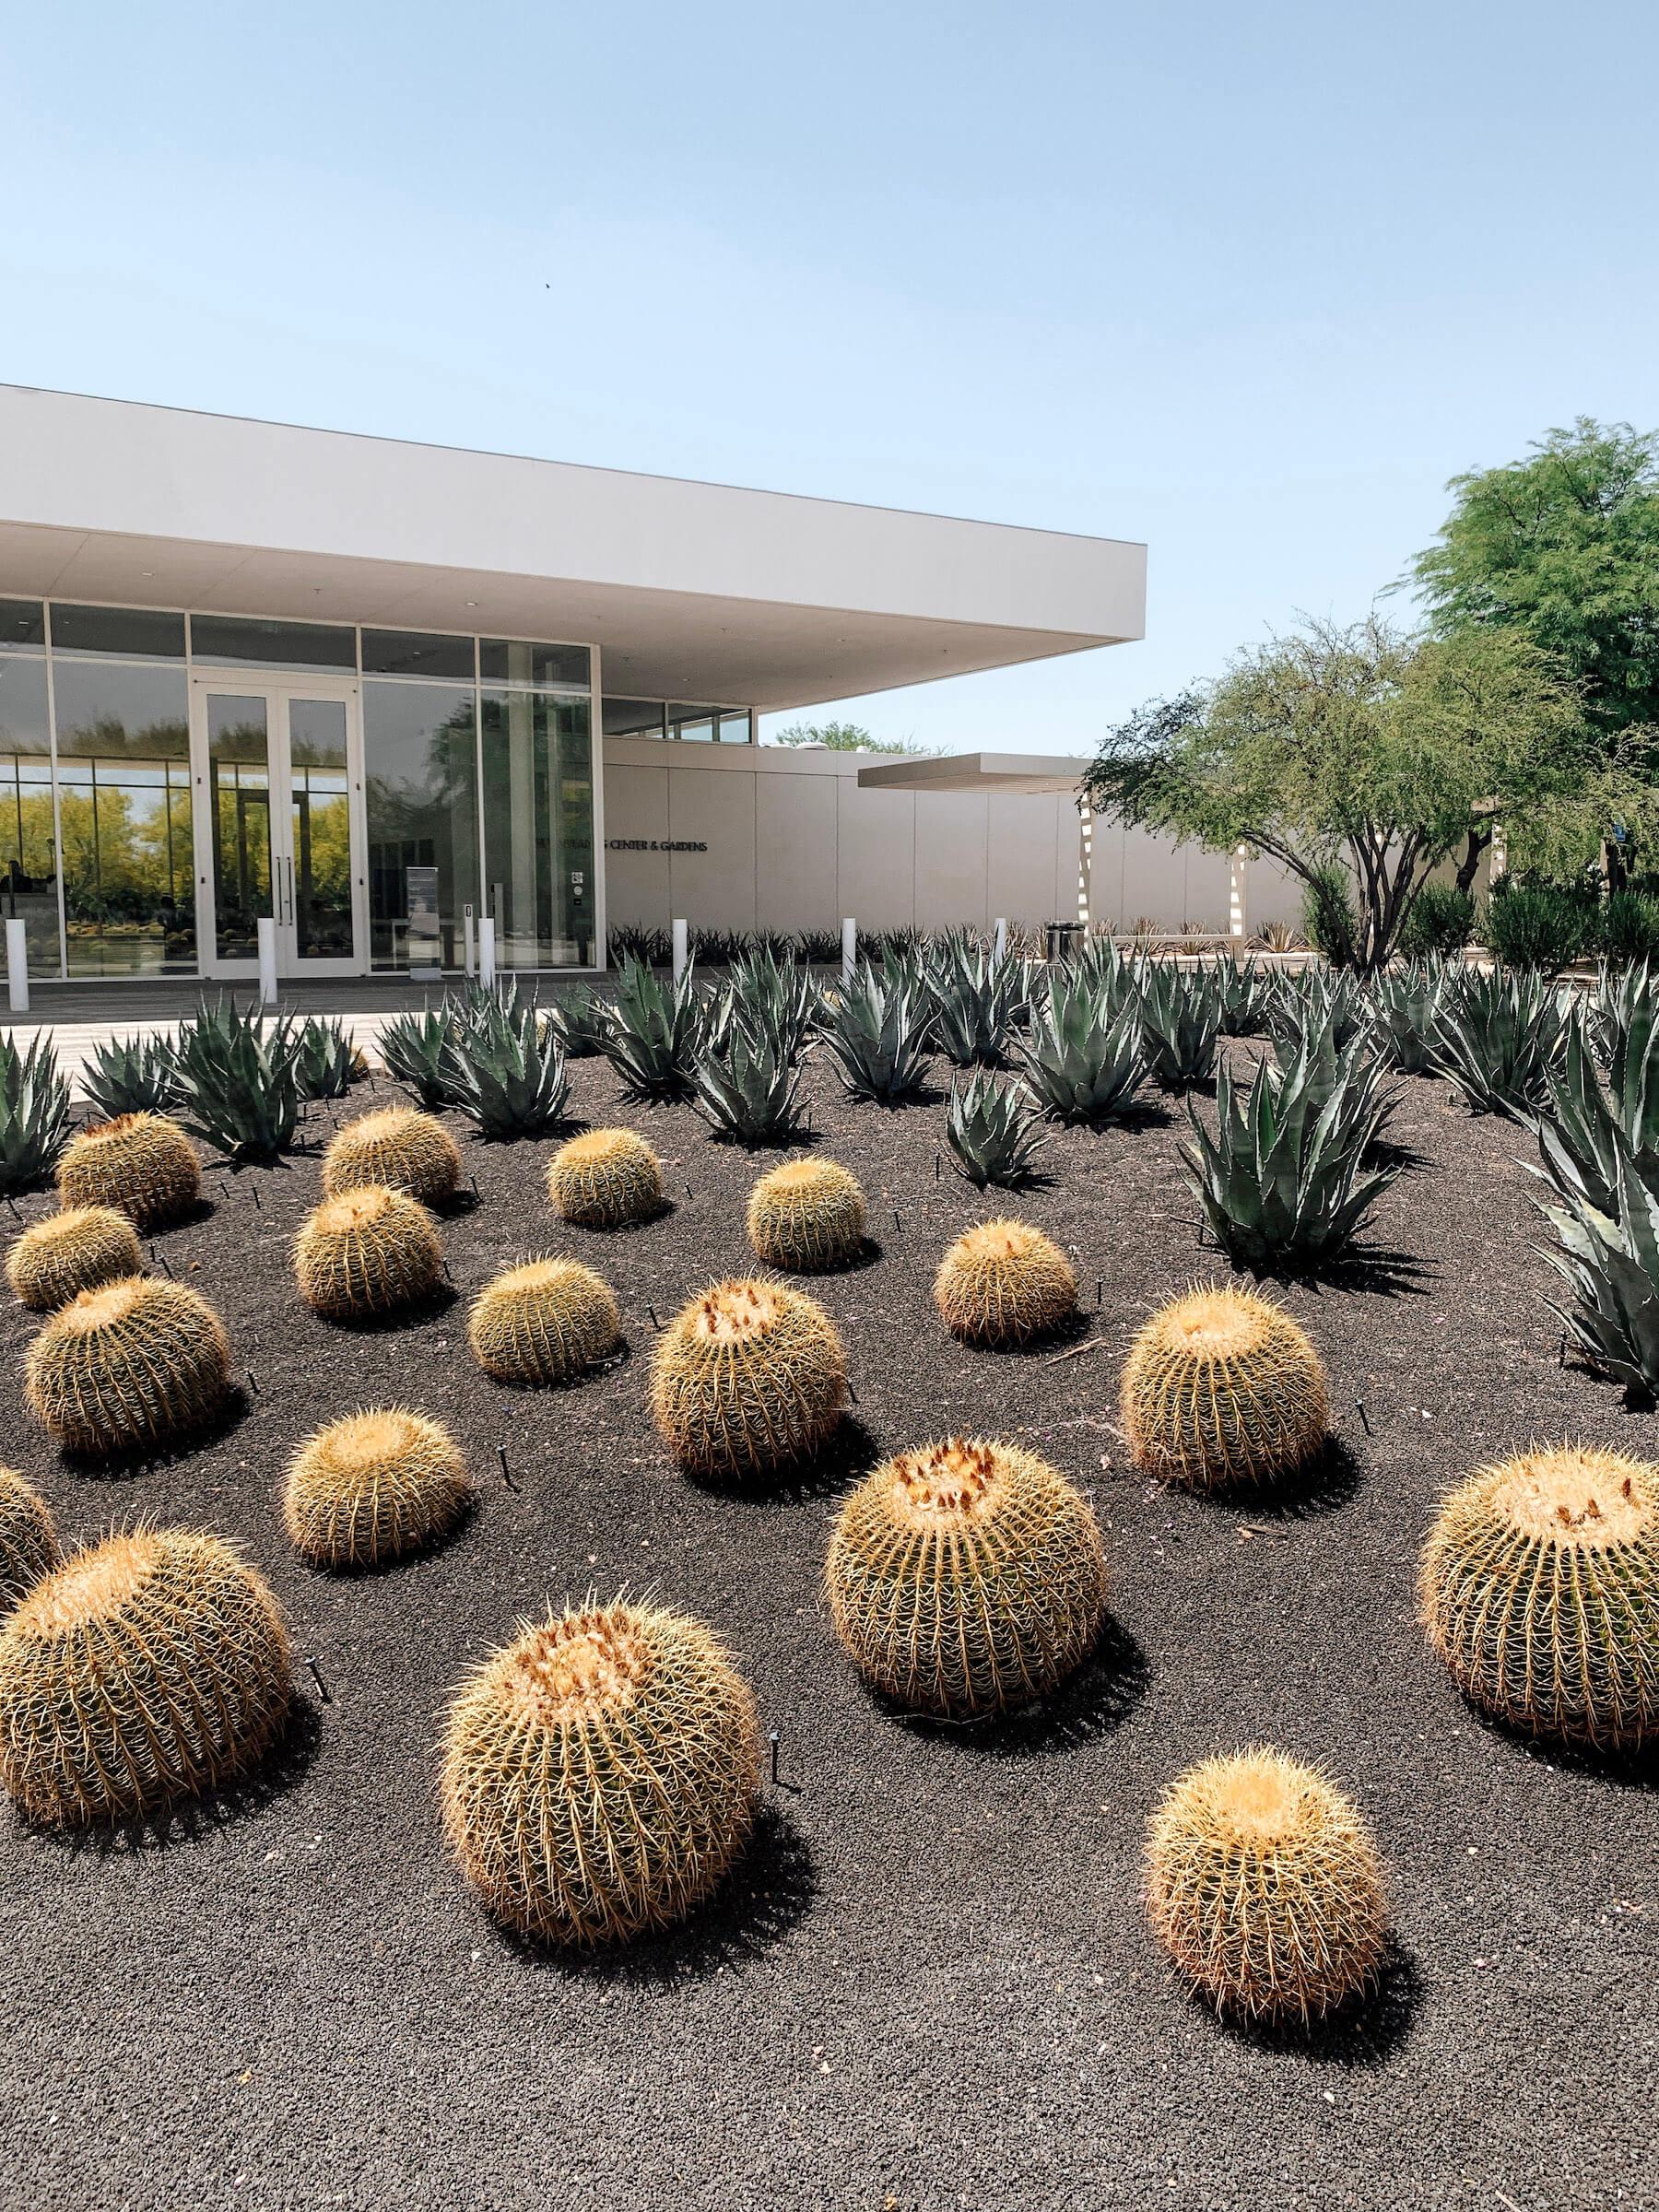 Sunnylands Center and Gardens - méconnus incontournables Palm Springs - voyage en Californie